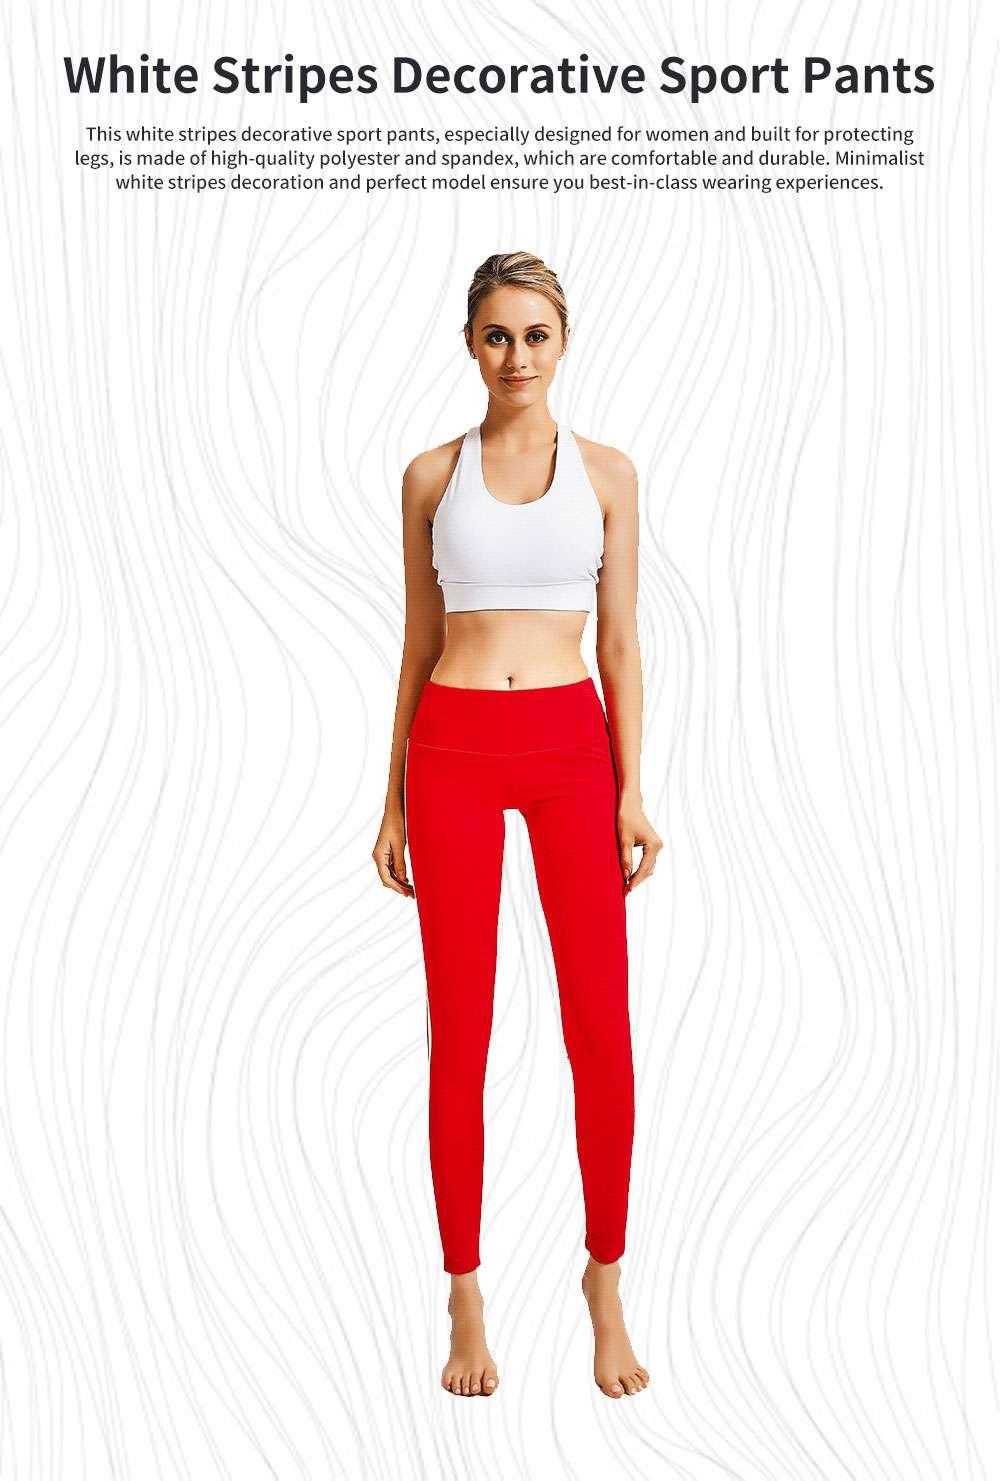 Stylish Minimalist Side White Stripes Decorative Long Sport Pants Lifting Butt Slim Fit Casual Yoga Dancing Pants for Ladies 0